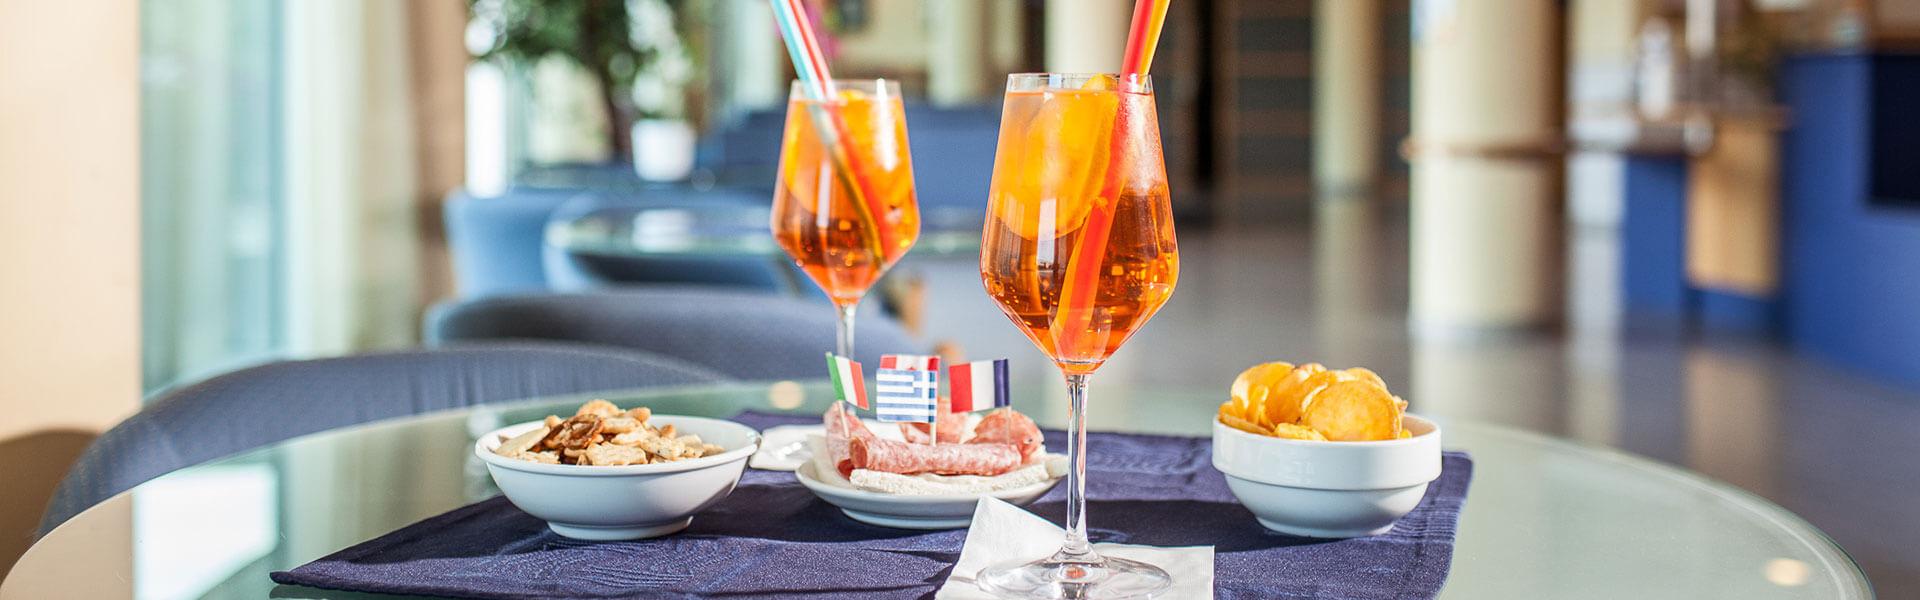 Hotel Mastai Senigallia sale meeting e convegni con catering